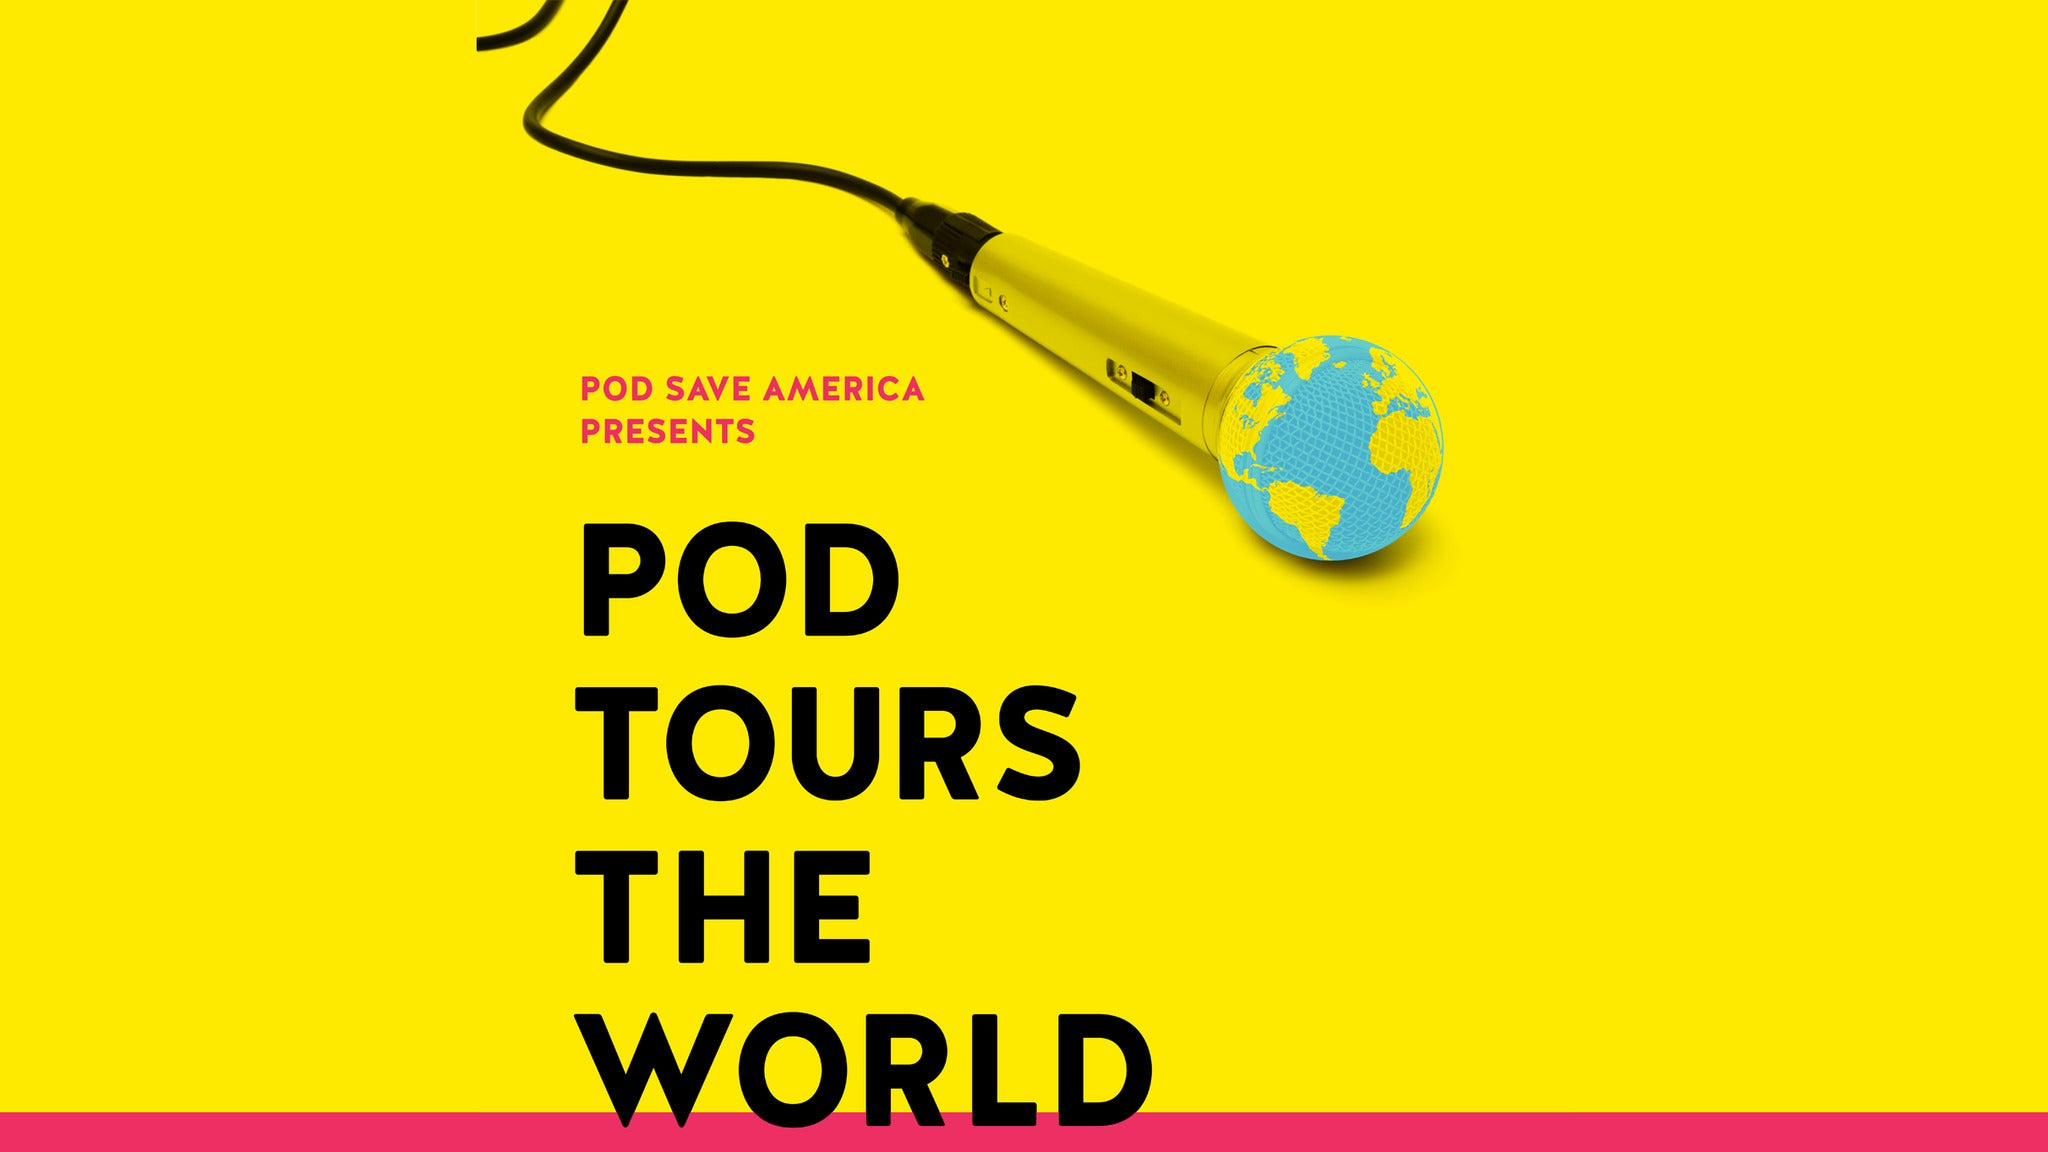 Pod Tours America